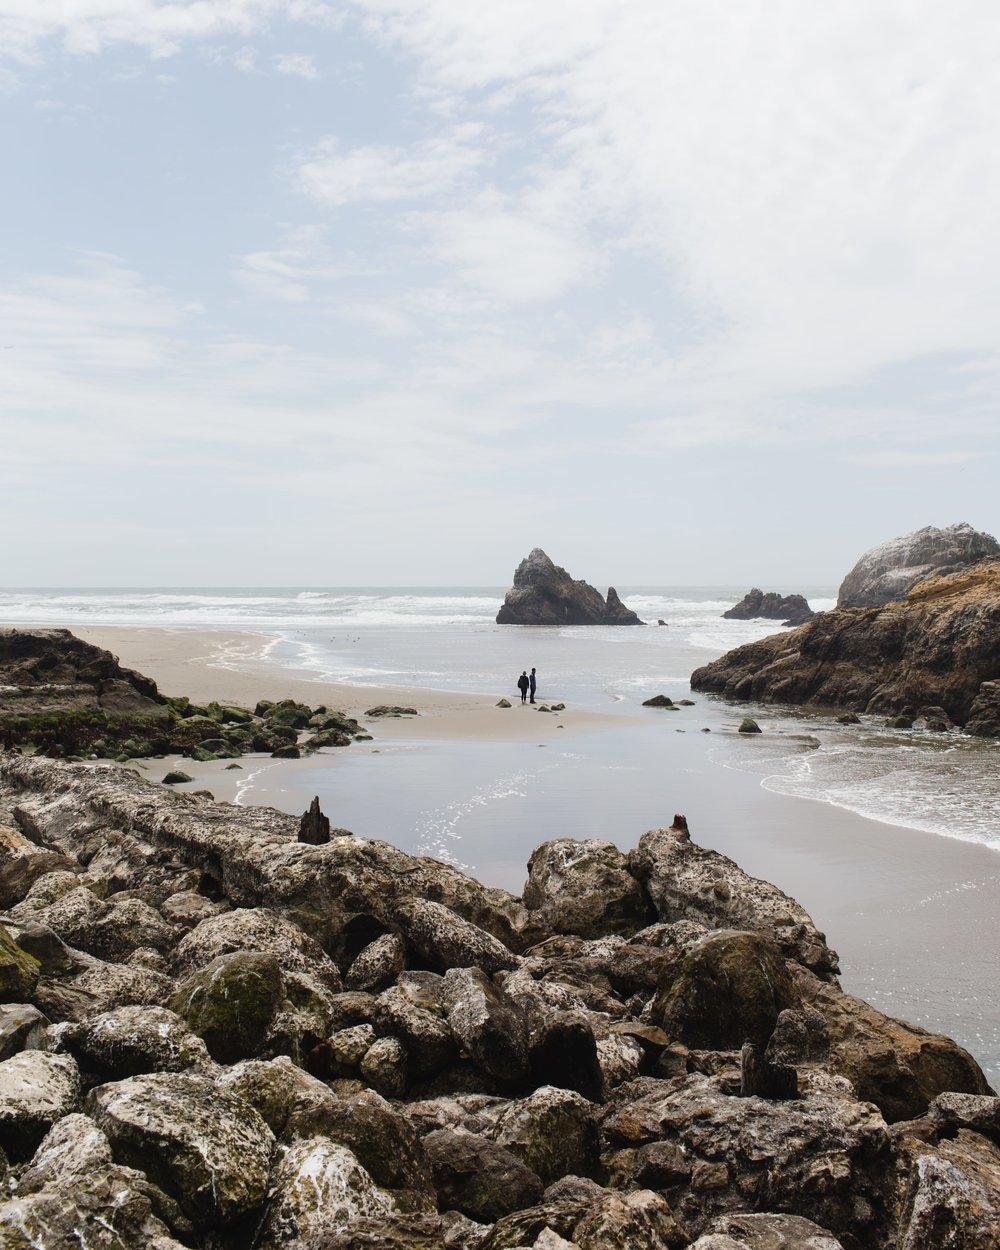 Spring_Morris_Photography_Travel_San_Francisco-1-4.jpg